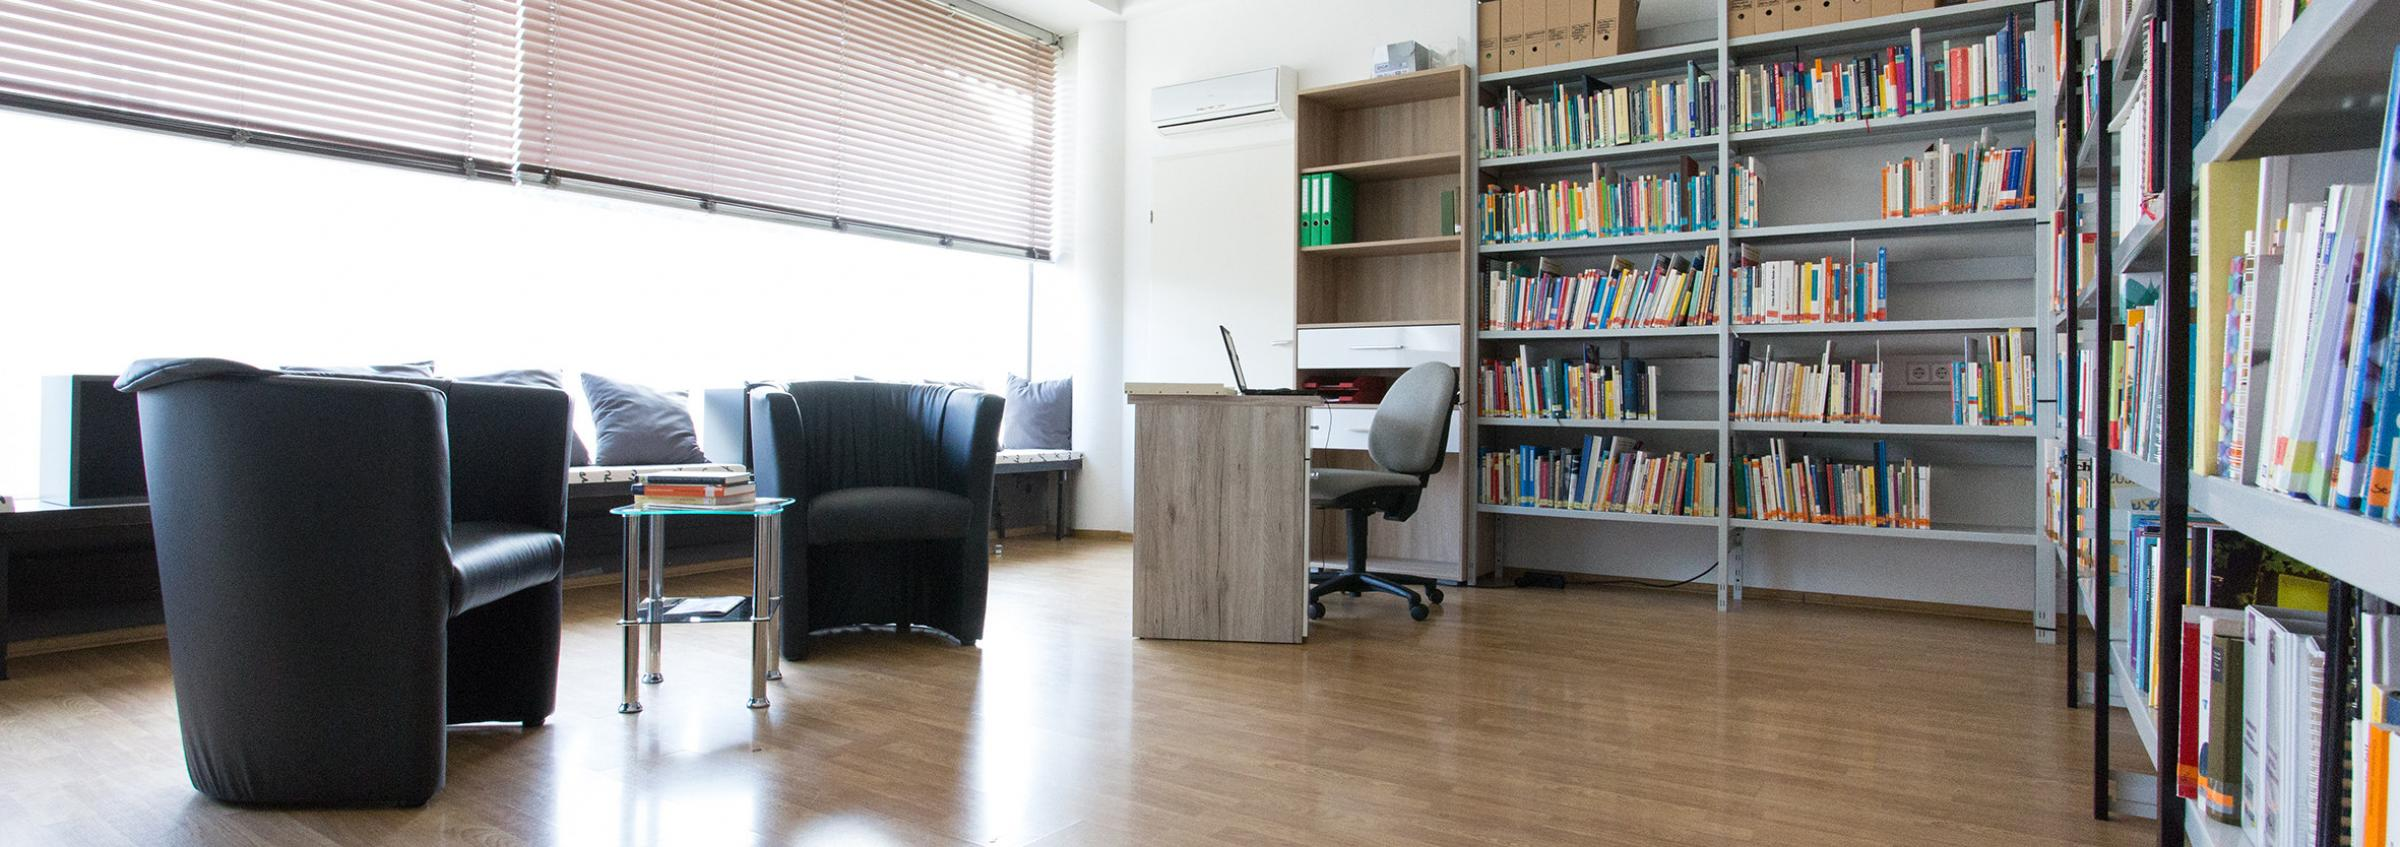 Inklusive Bibliothek